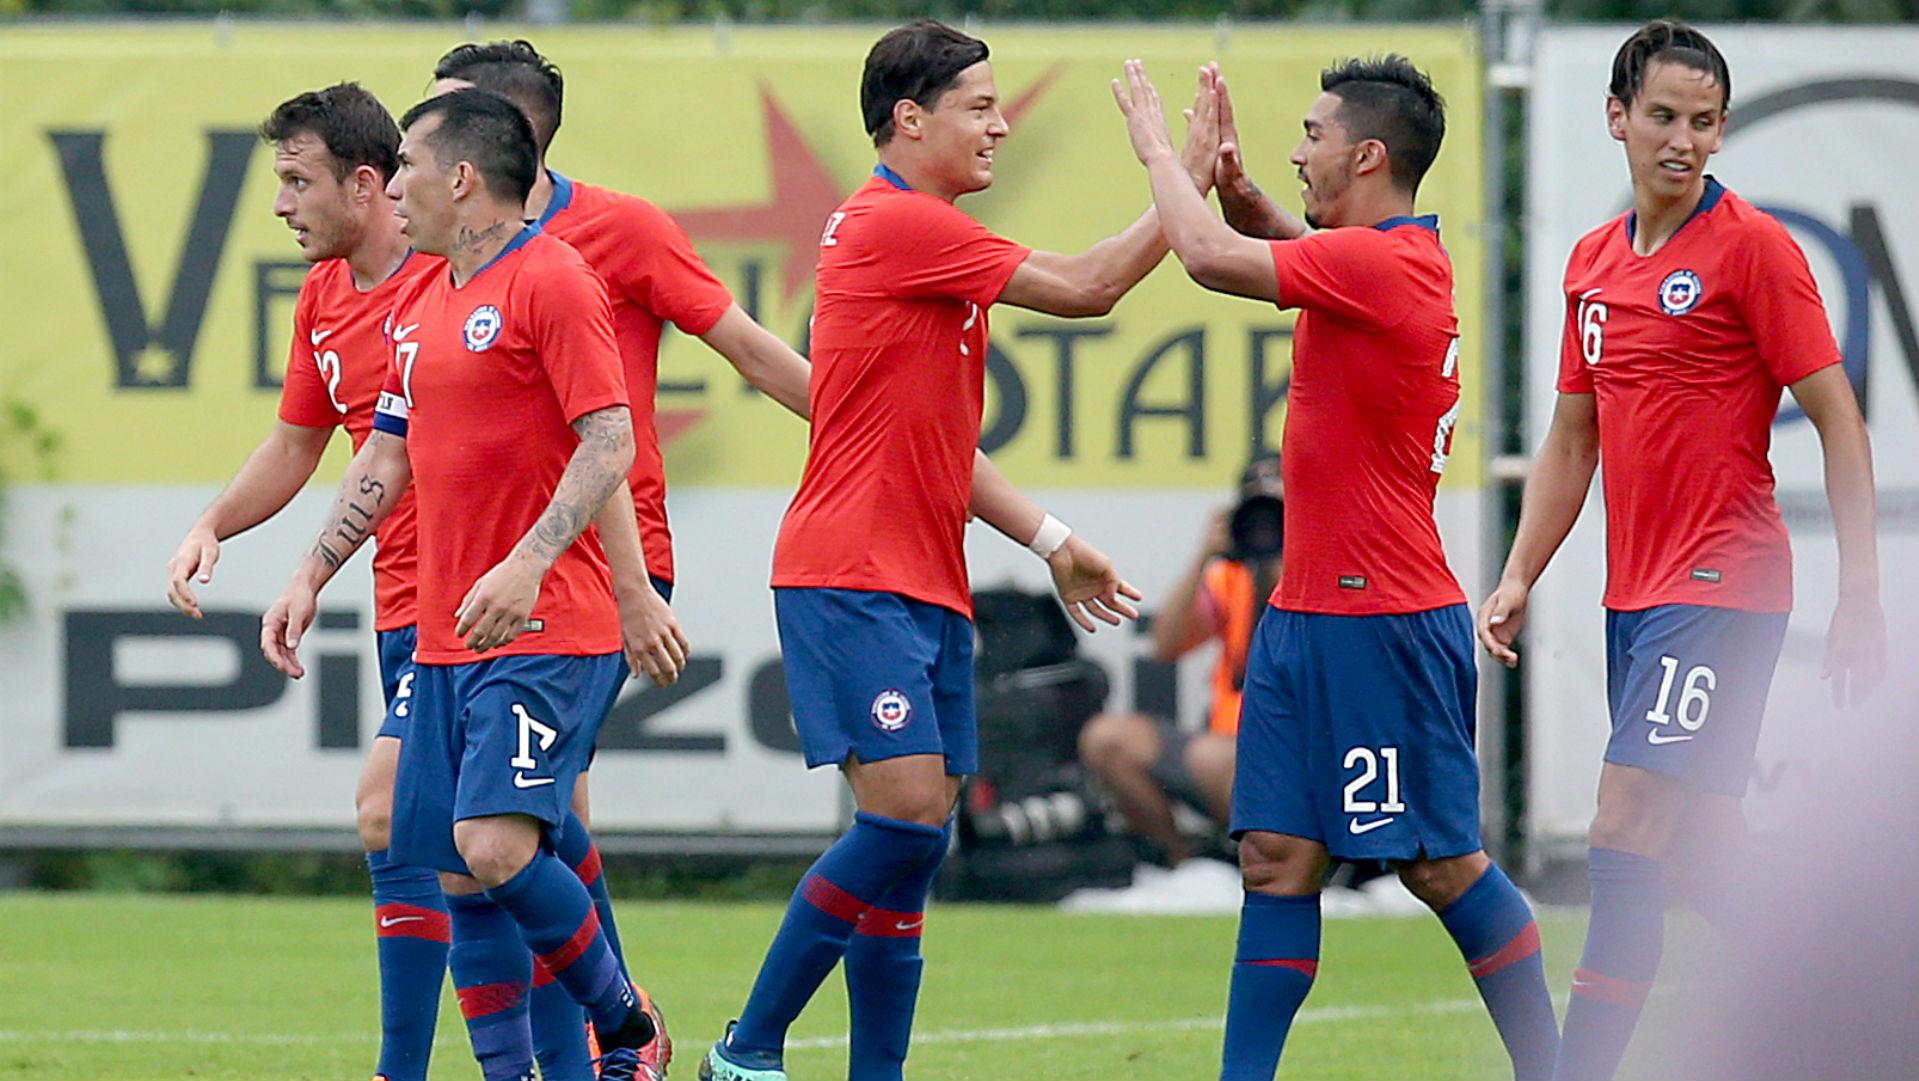 310518 Chile Rumania Lorenzo Reyes - Igor Lichnovsky - Gary Medel - Miiko Albornoz - Ángelo Henríquez